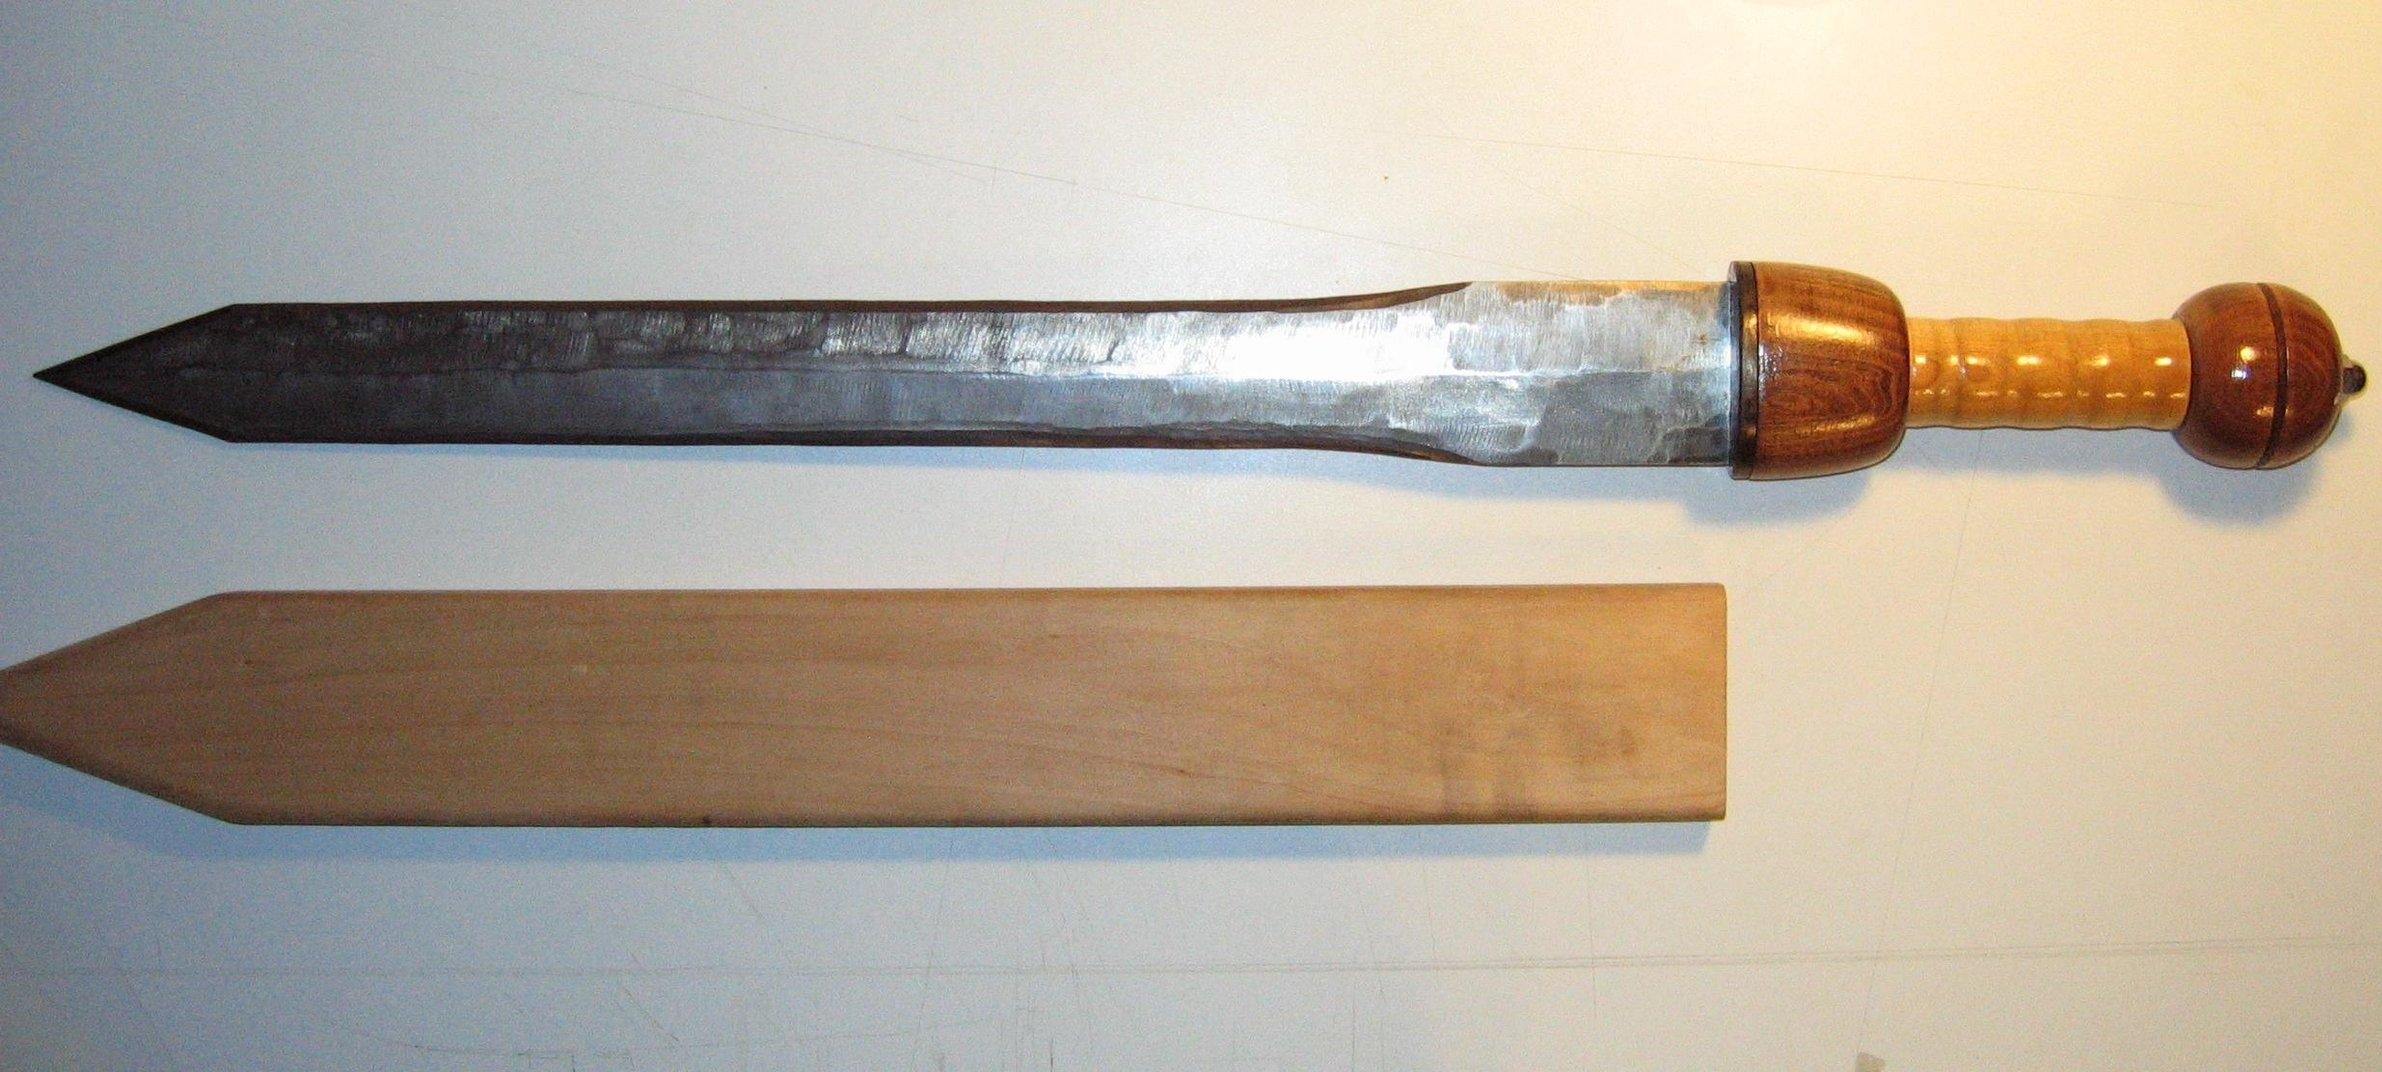 Blades 002.jpg